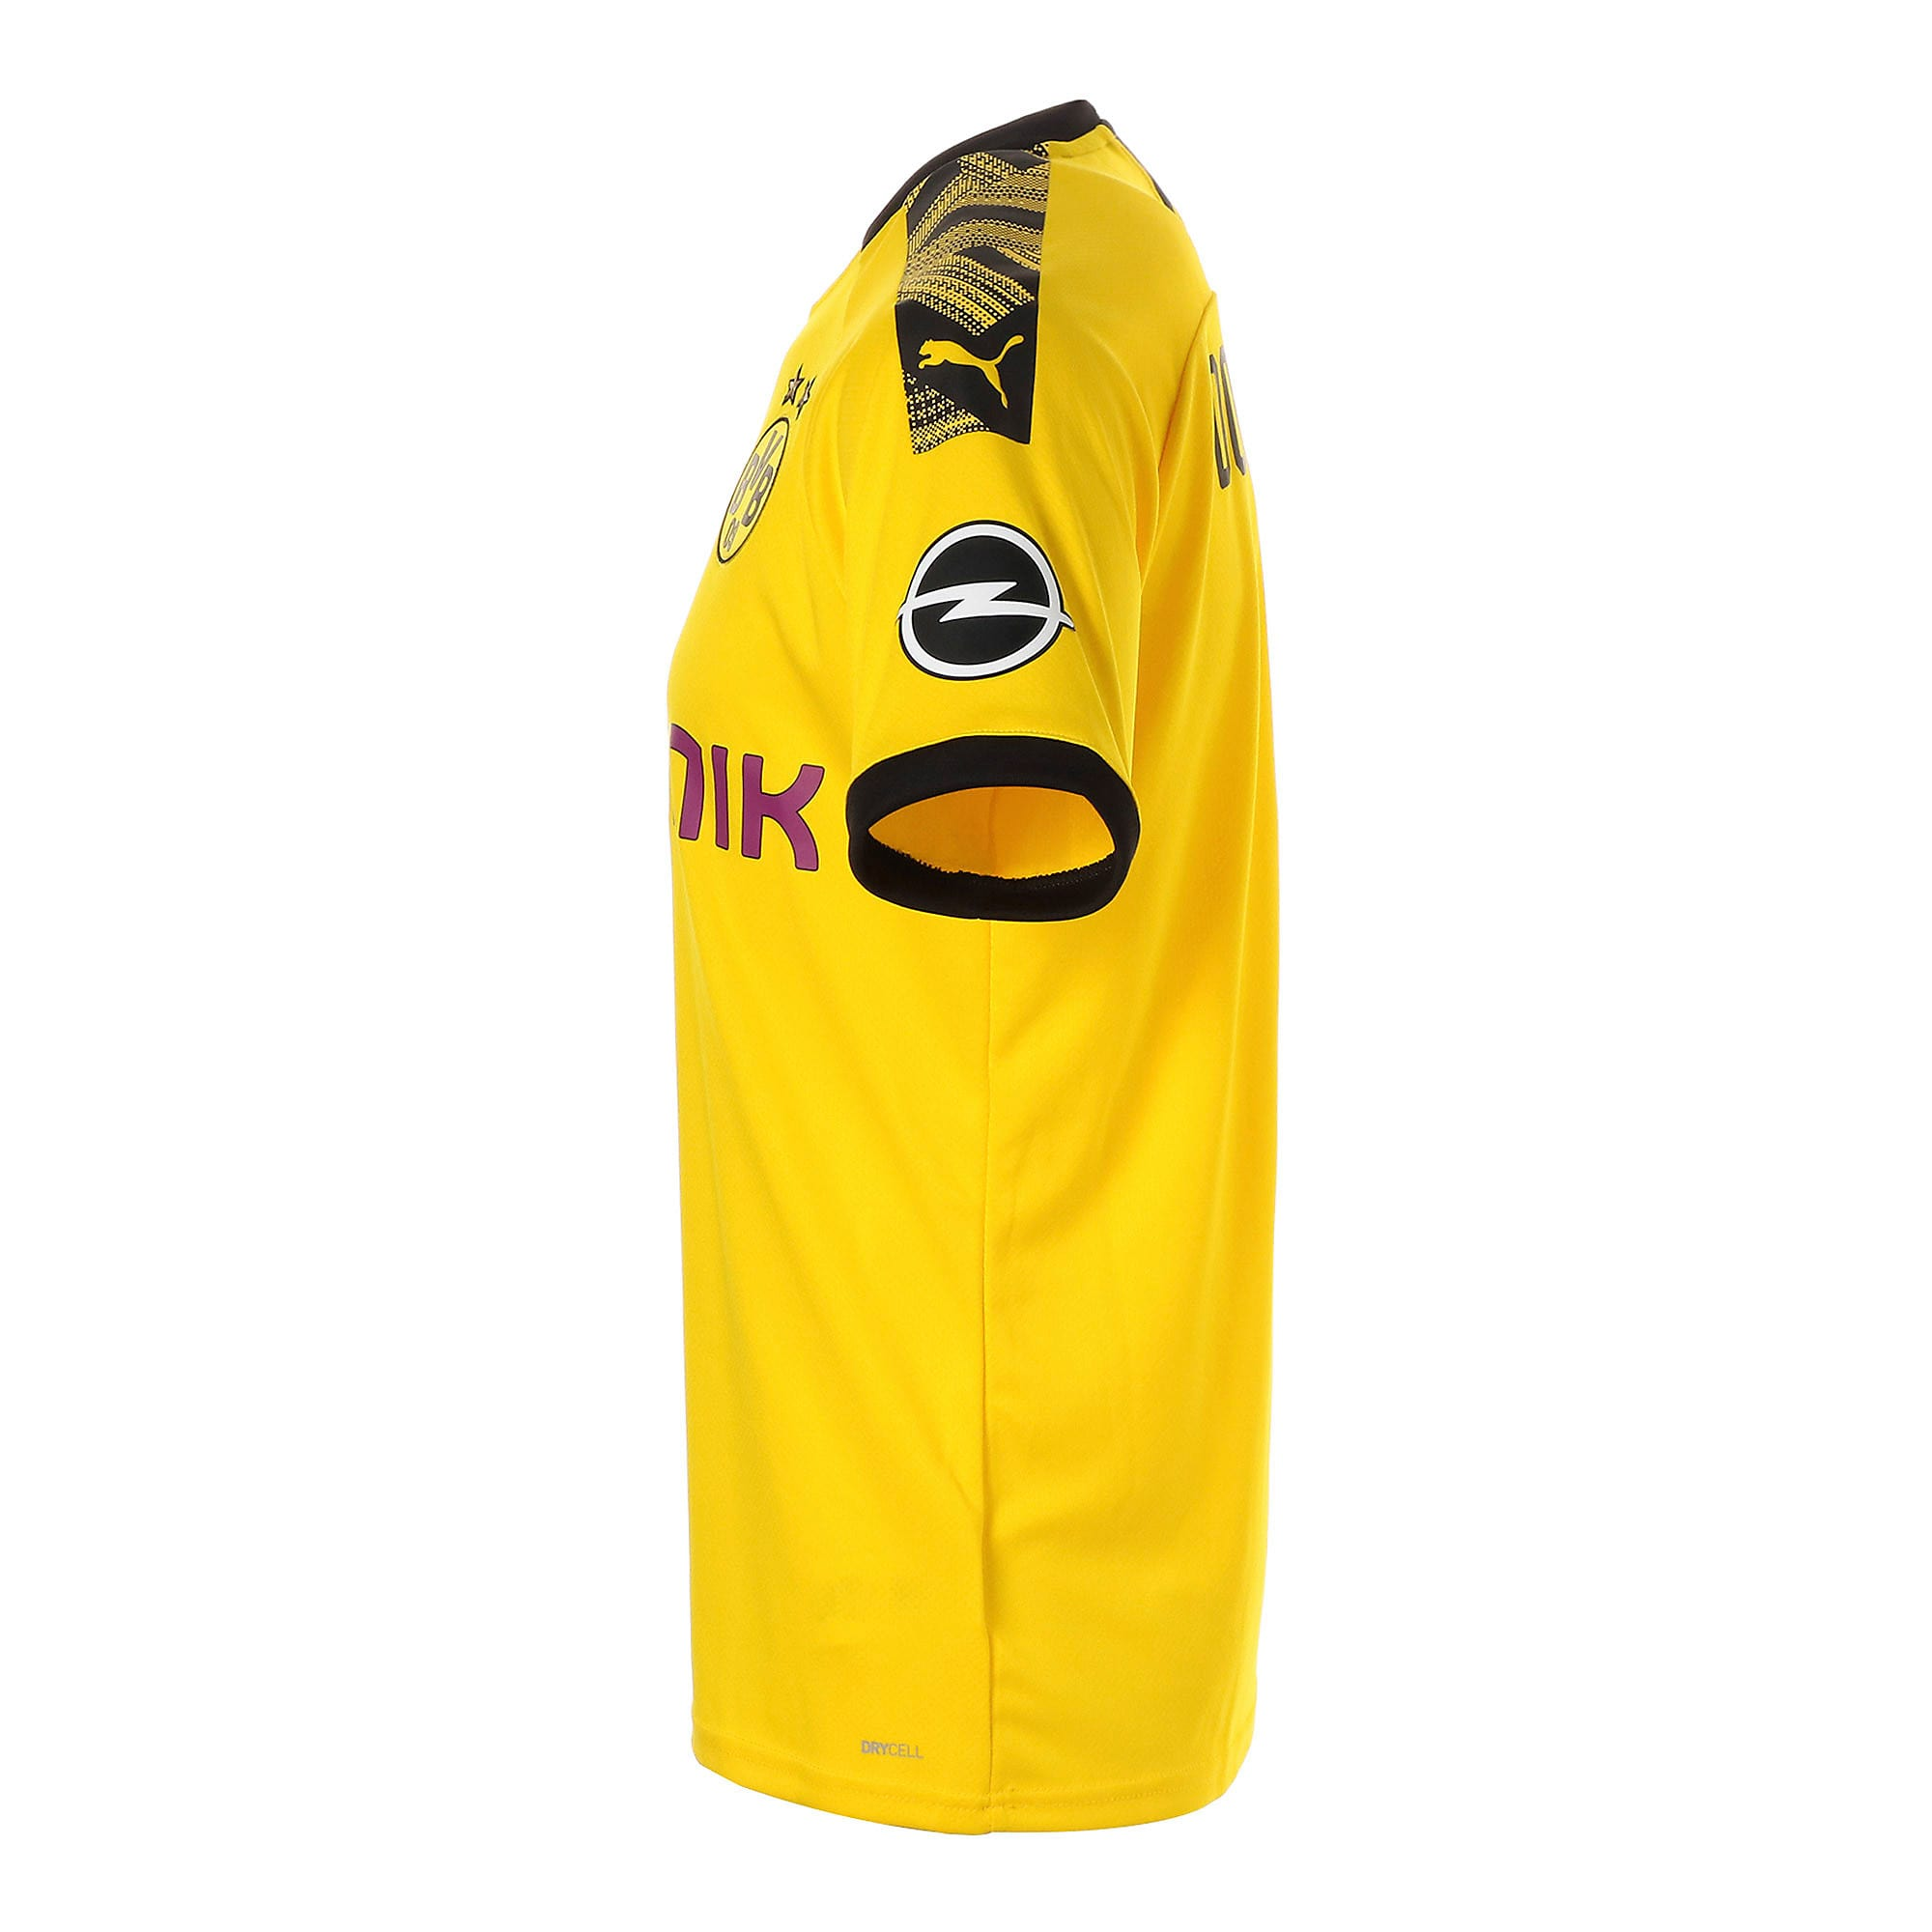 Thumbnail 2 of ドルトムント BVB SS ホーム レプリカシャツ 半袖, Cyber Yellow-Puma Black, medium-JPN